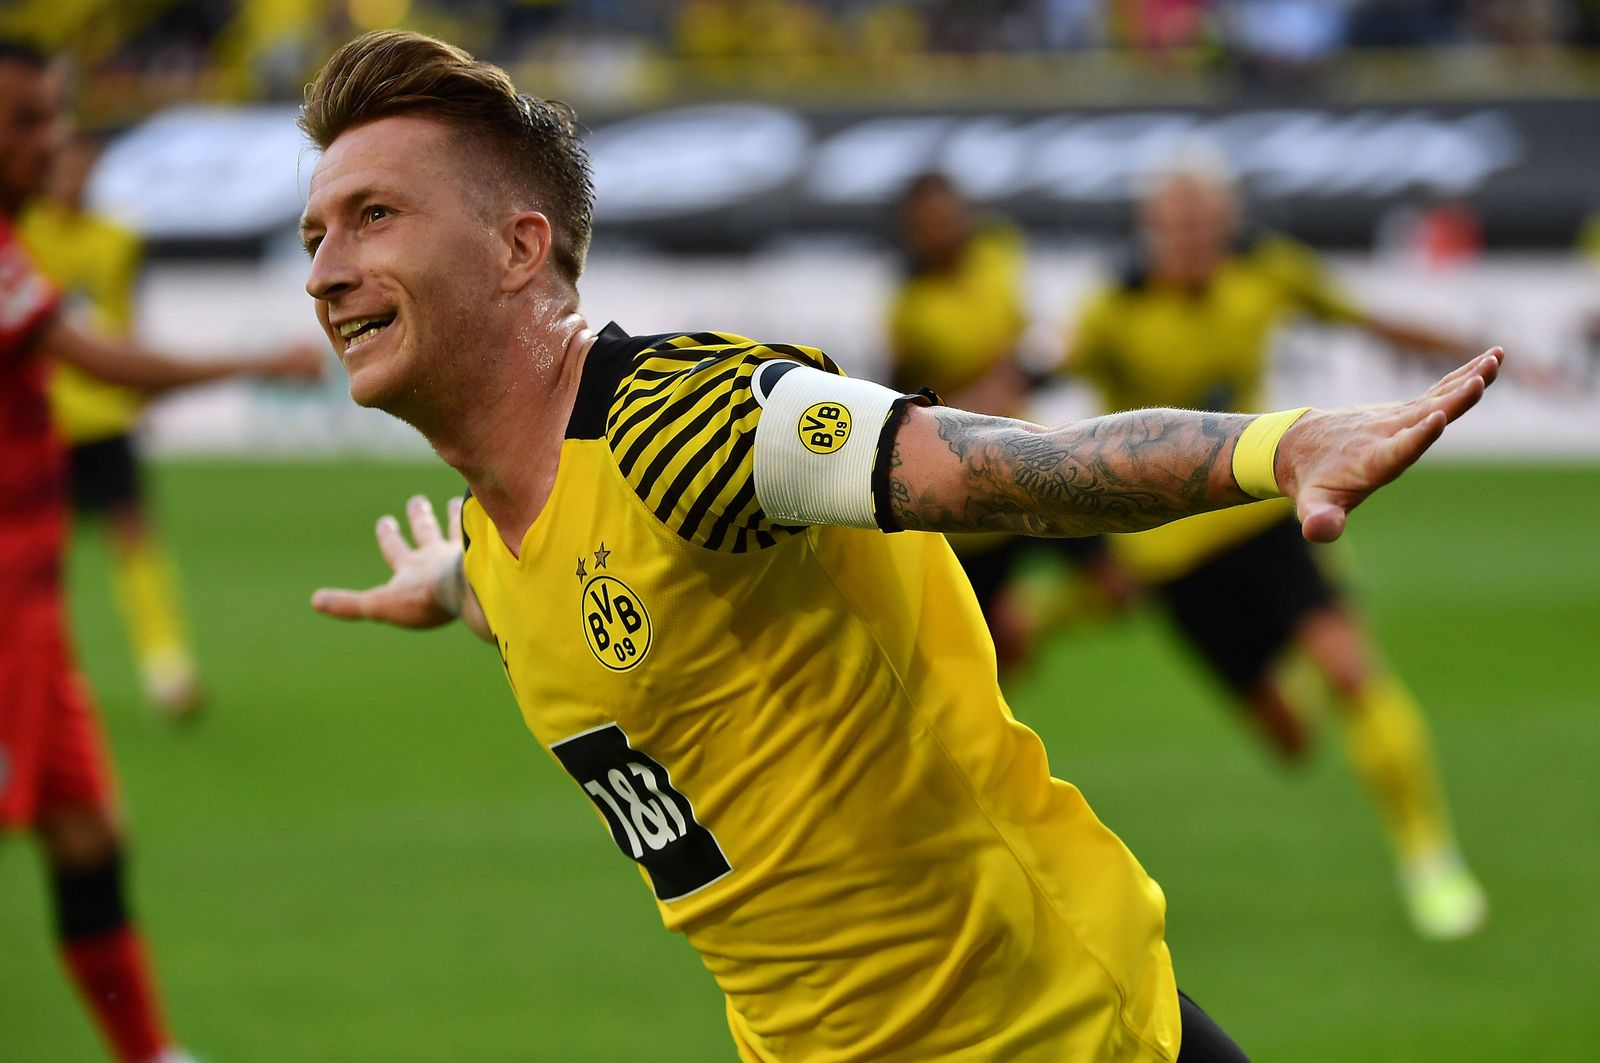 14.08.2021, xjhx, Fussball 1.Bundesliga, Borussia Dortmund - Eintracht Frankfurt emspor, v.l. Marco Reus (Borussia Dort